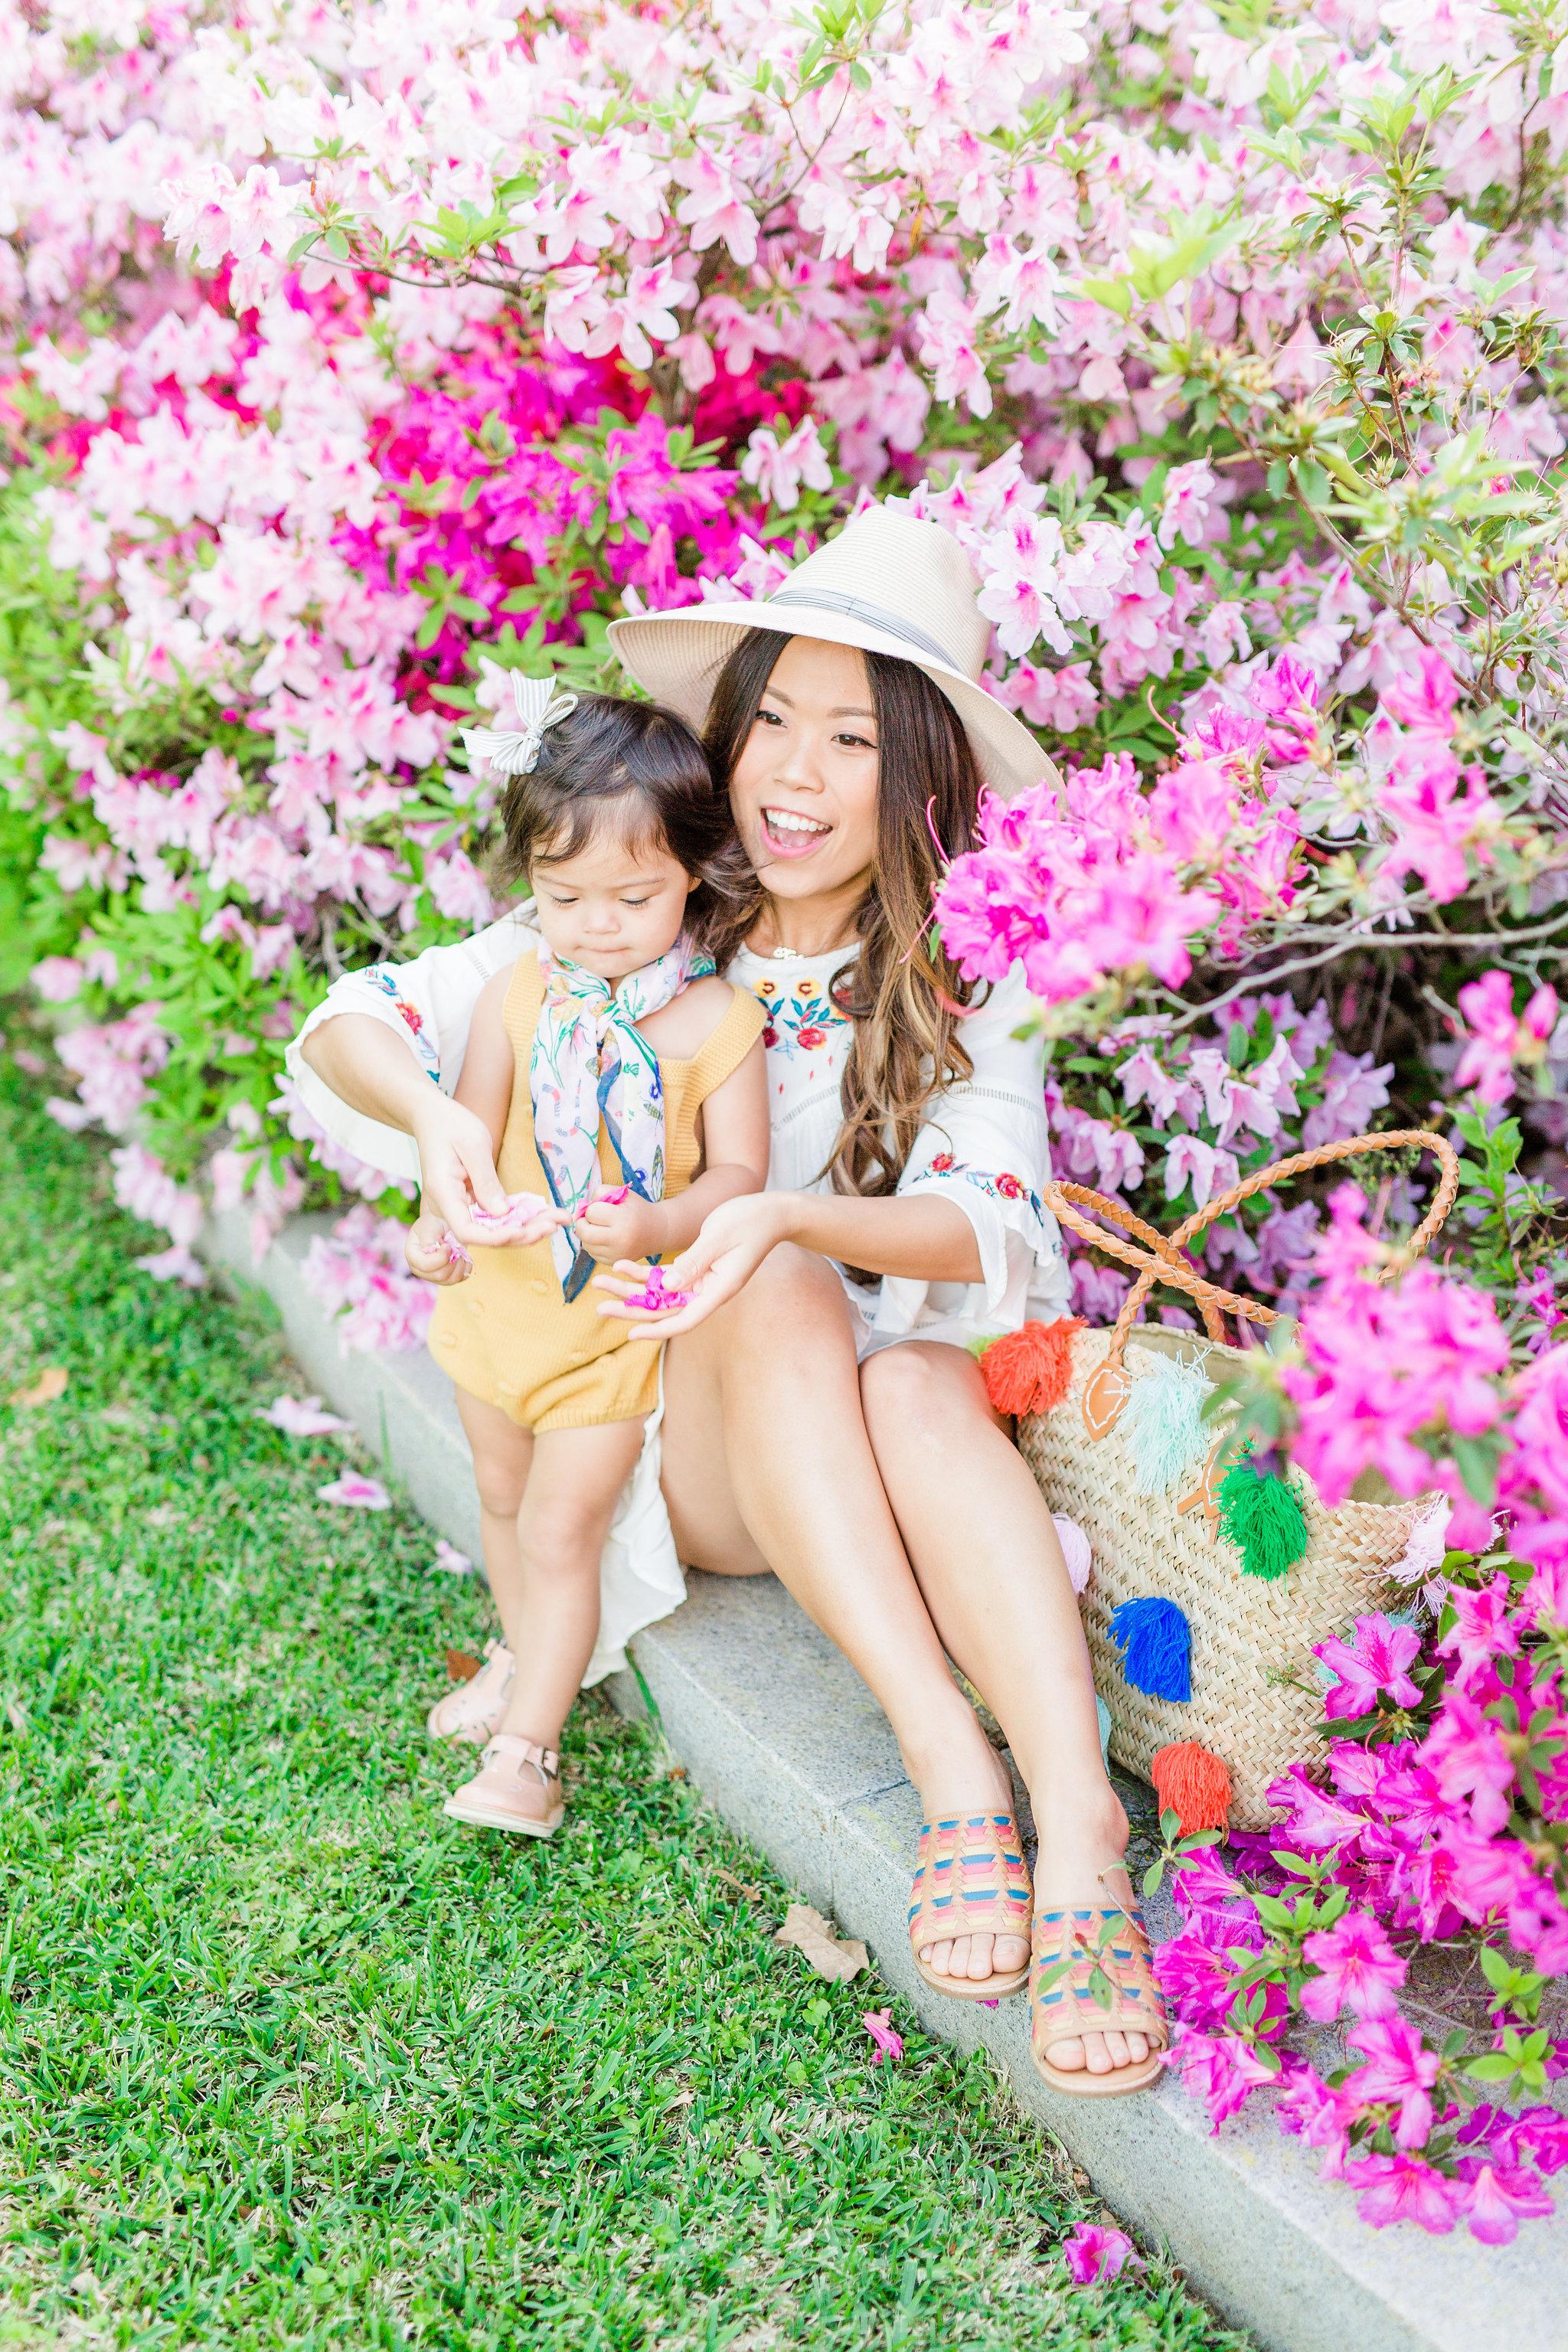 Joyfullygreen Comfortiva Brileigh Houston Azalea Trail Photoshoot. Pom Pom bag rainbow sandals mommy an me boho outfits.jpg